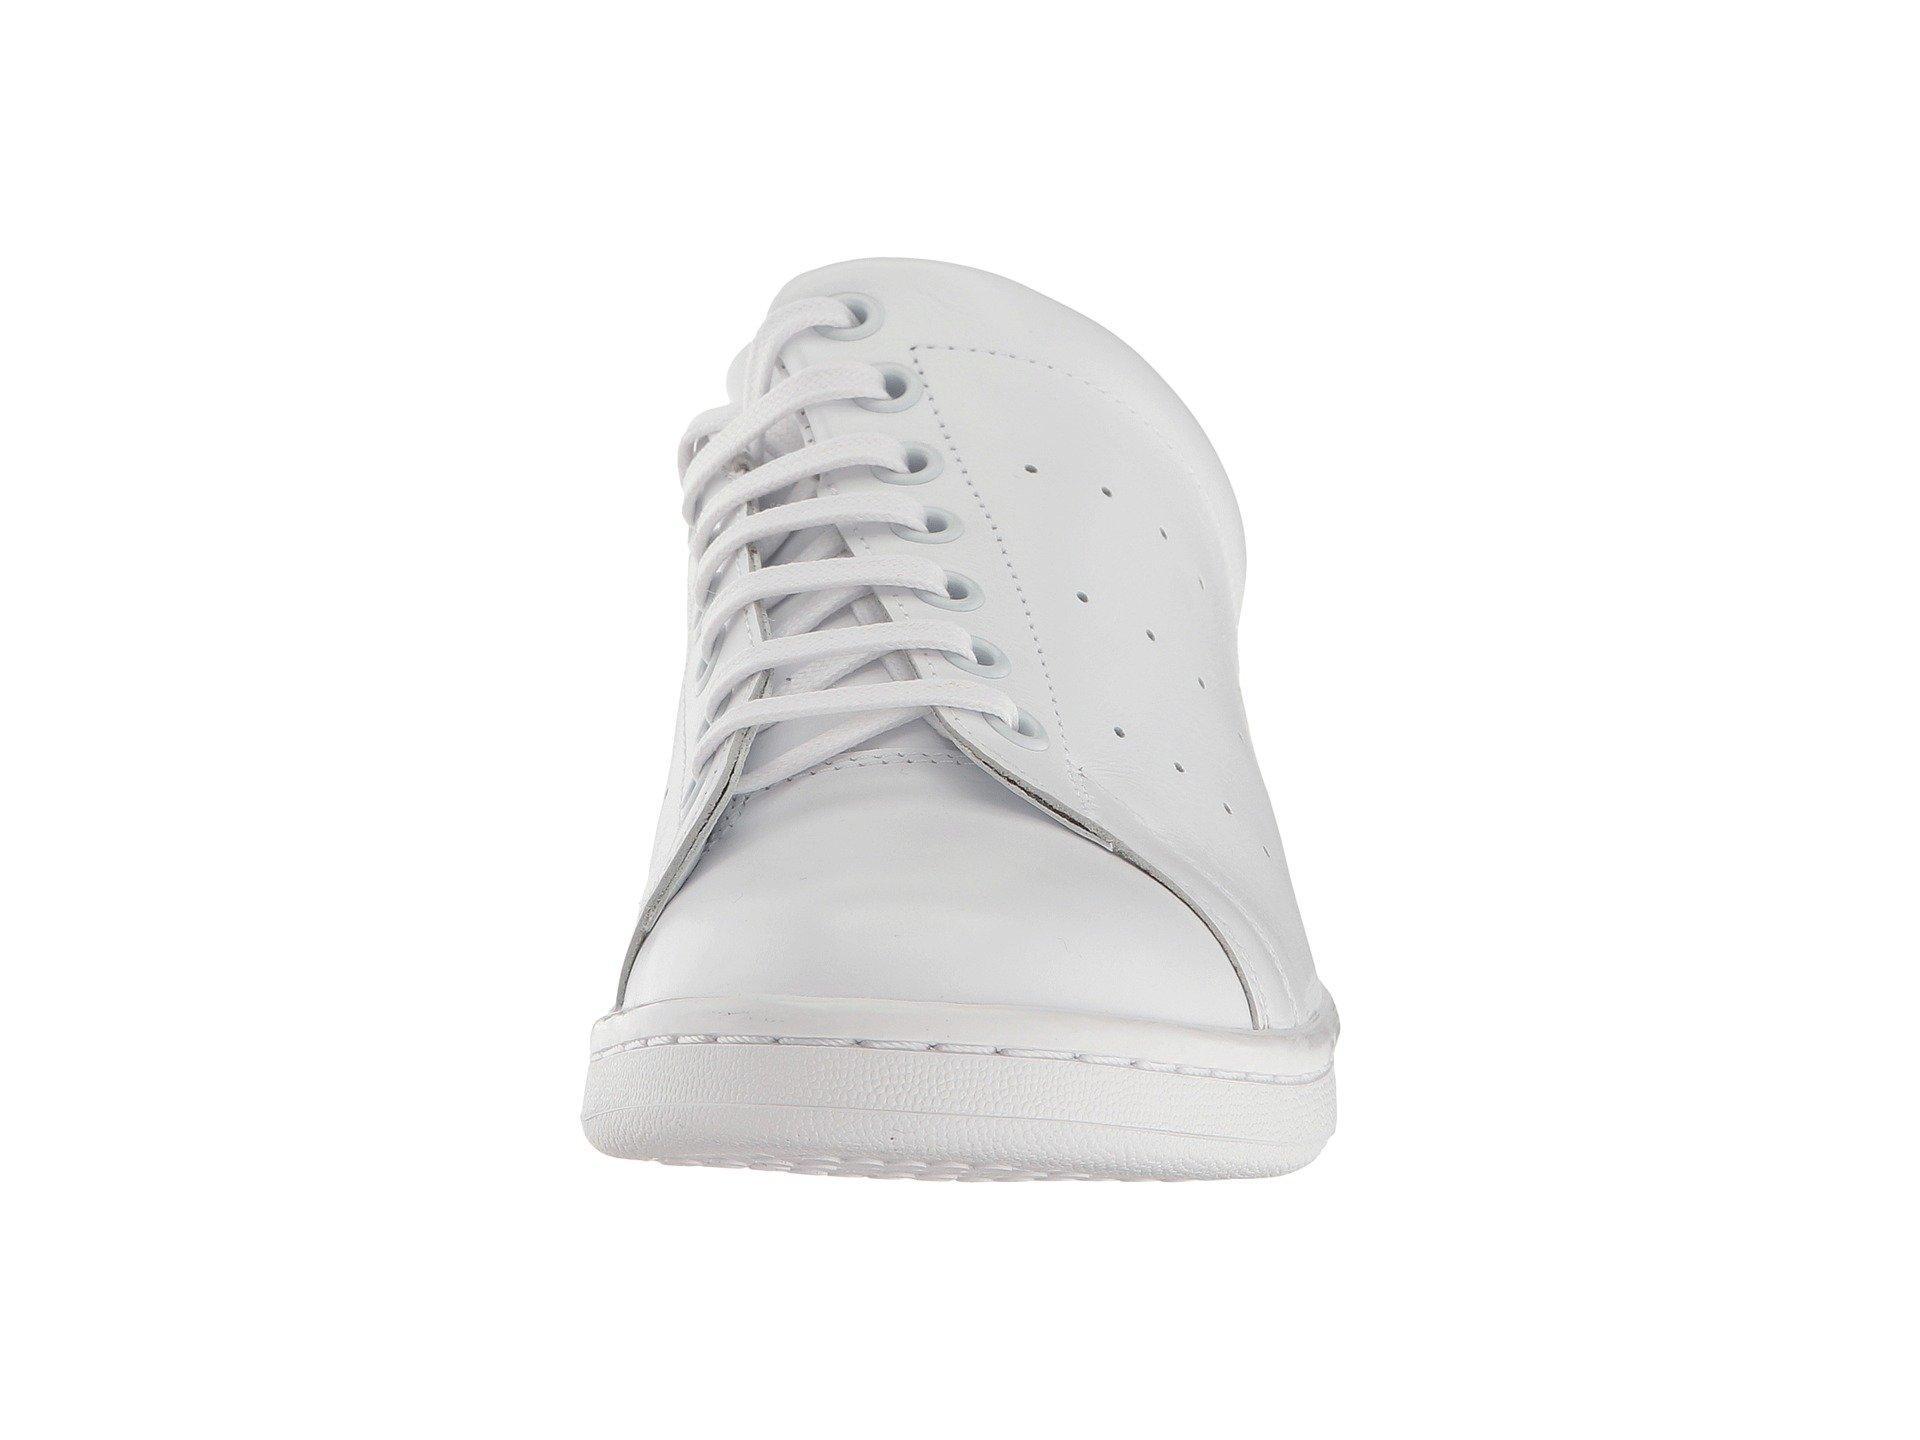 6d55f0566 Y s White Adidas Originals Edition Diagonal Stan Smith Sneakers ...